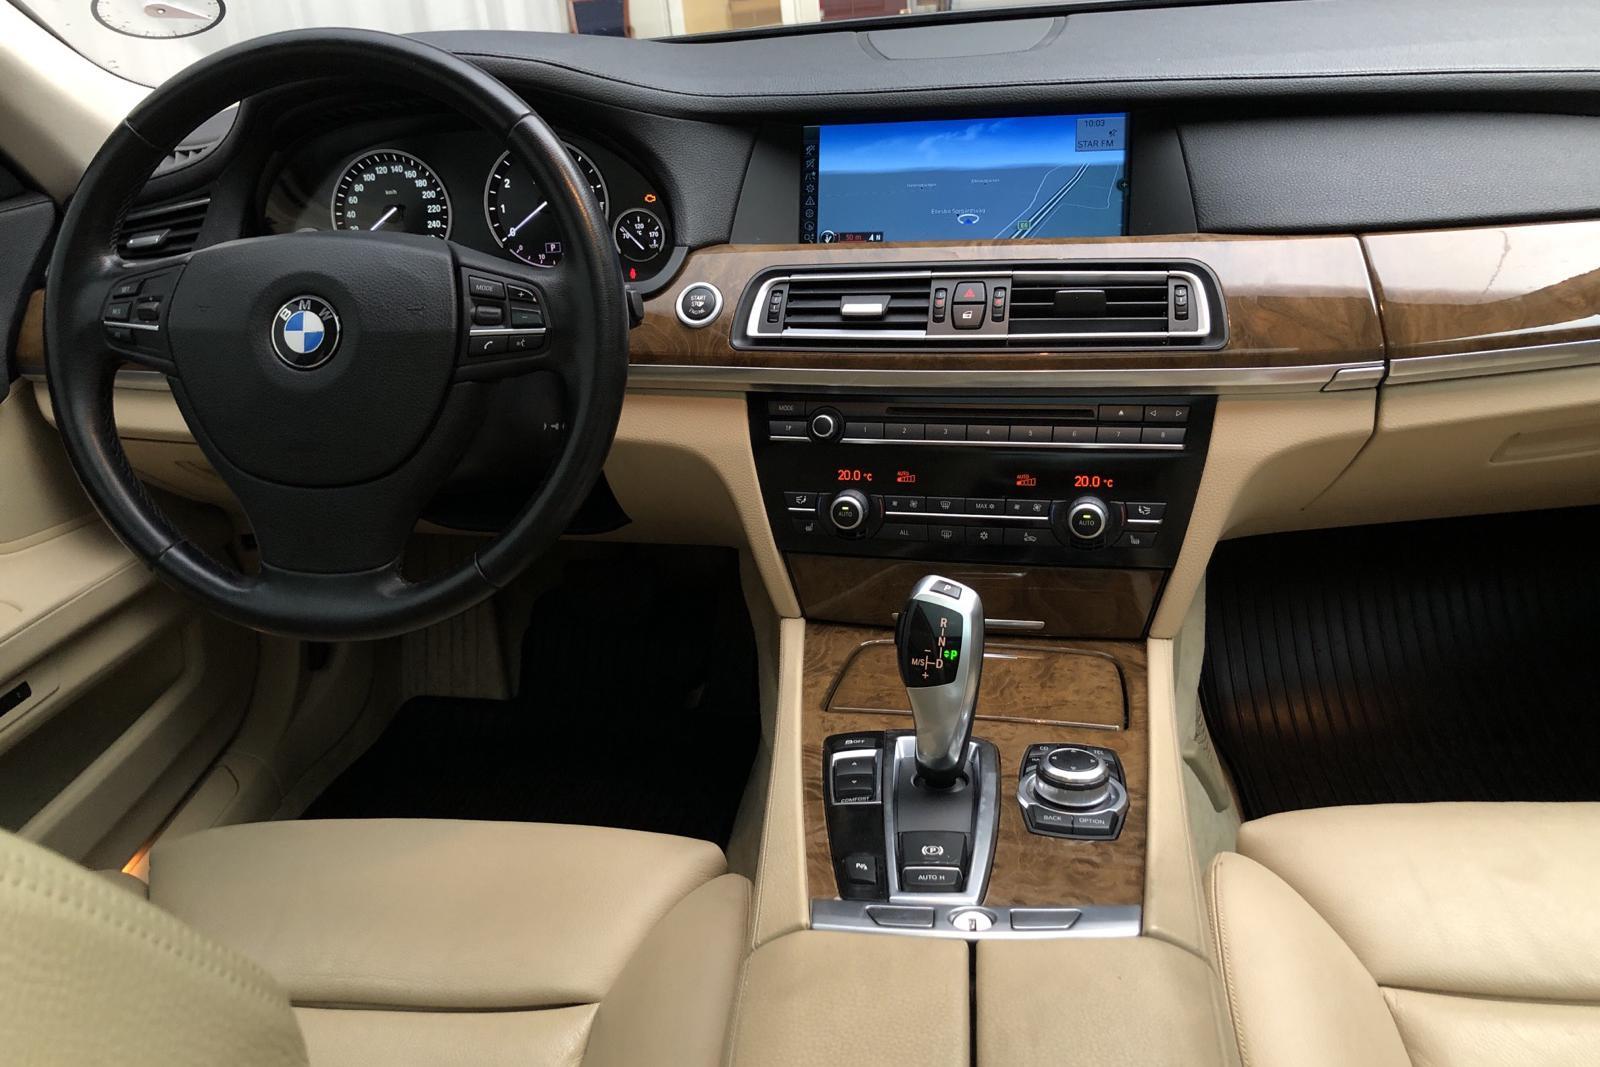 BMW 750i Sedan, F01 (407hk) - 173 230 km - Automatic - black - 2009